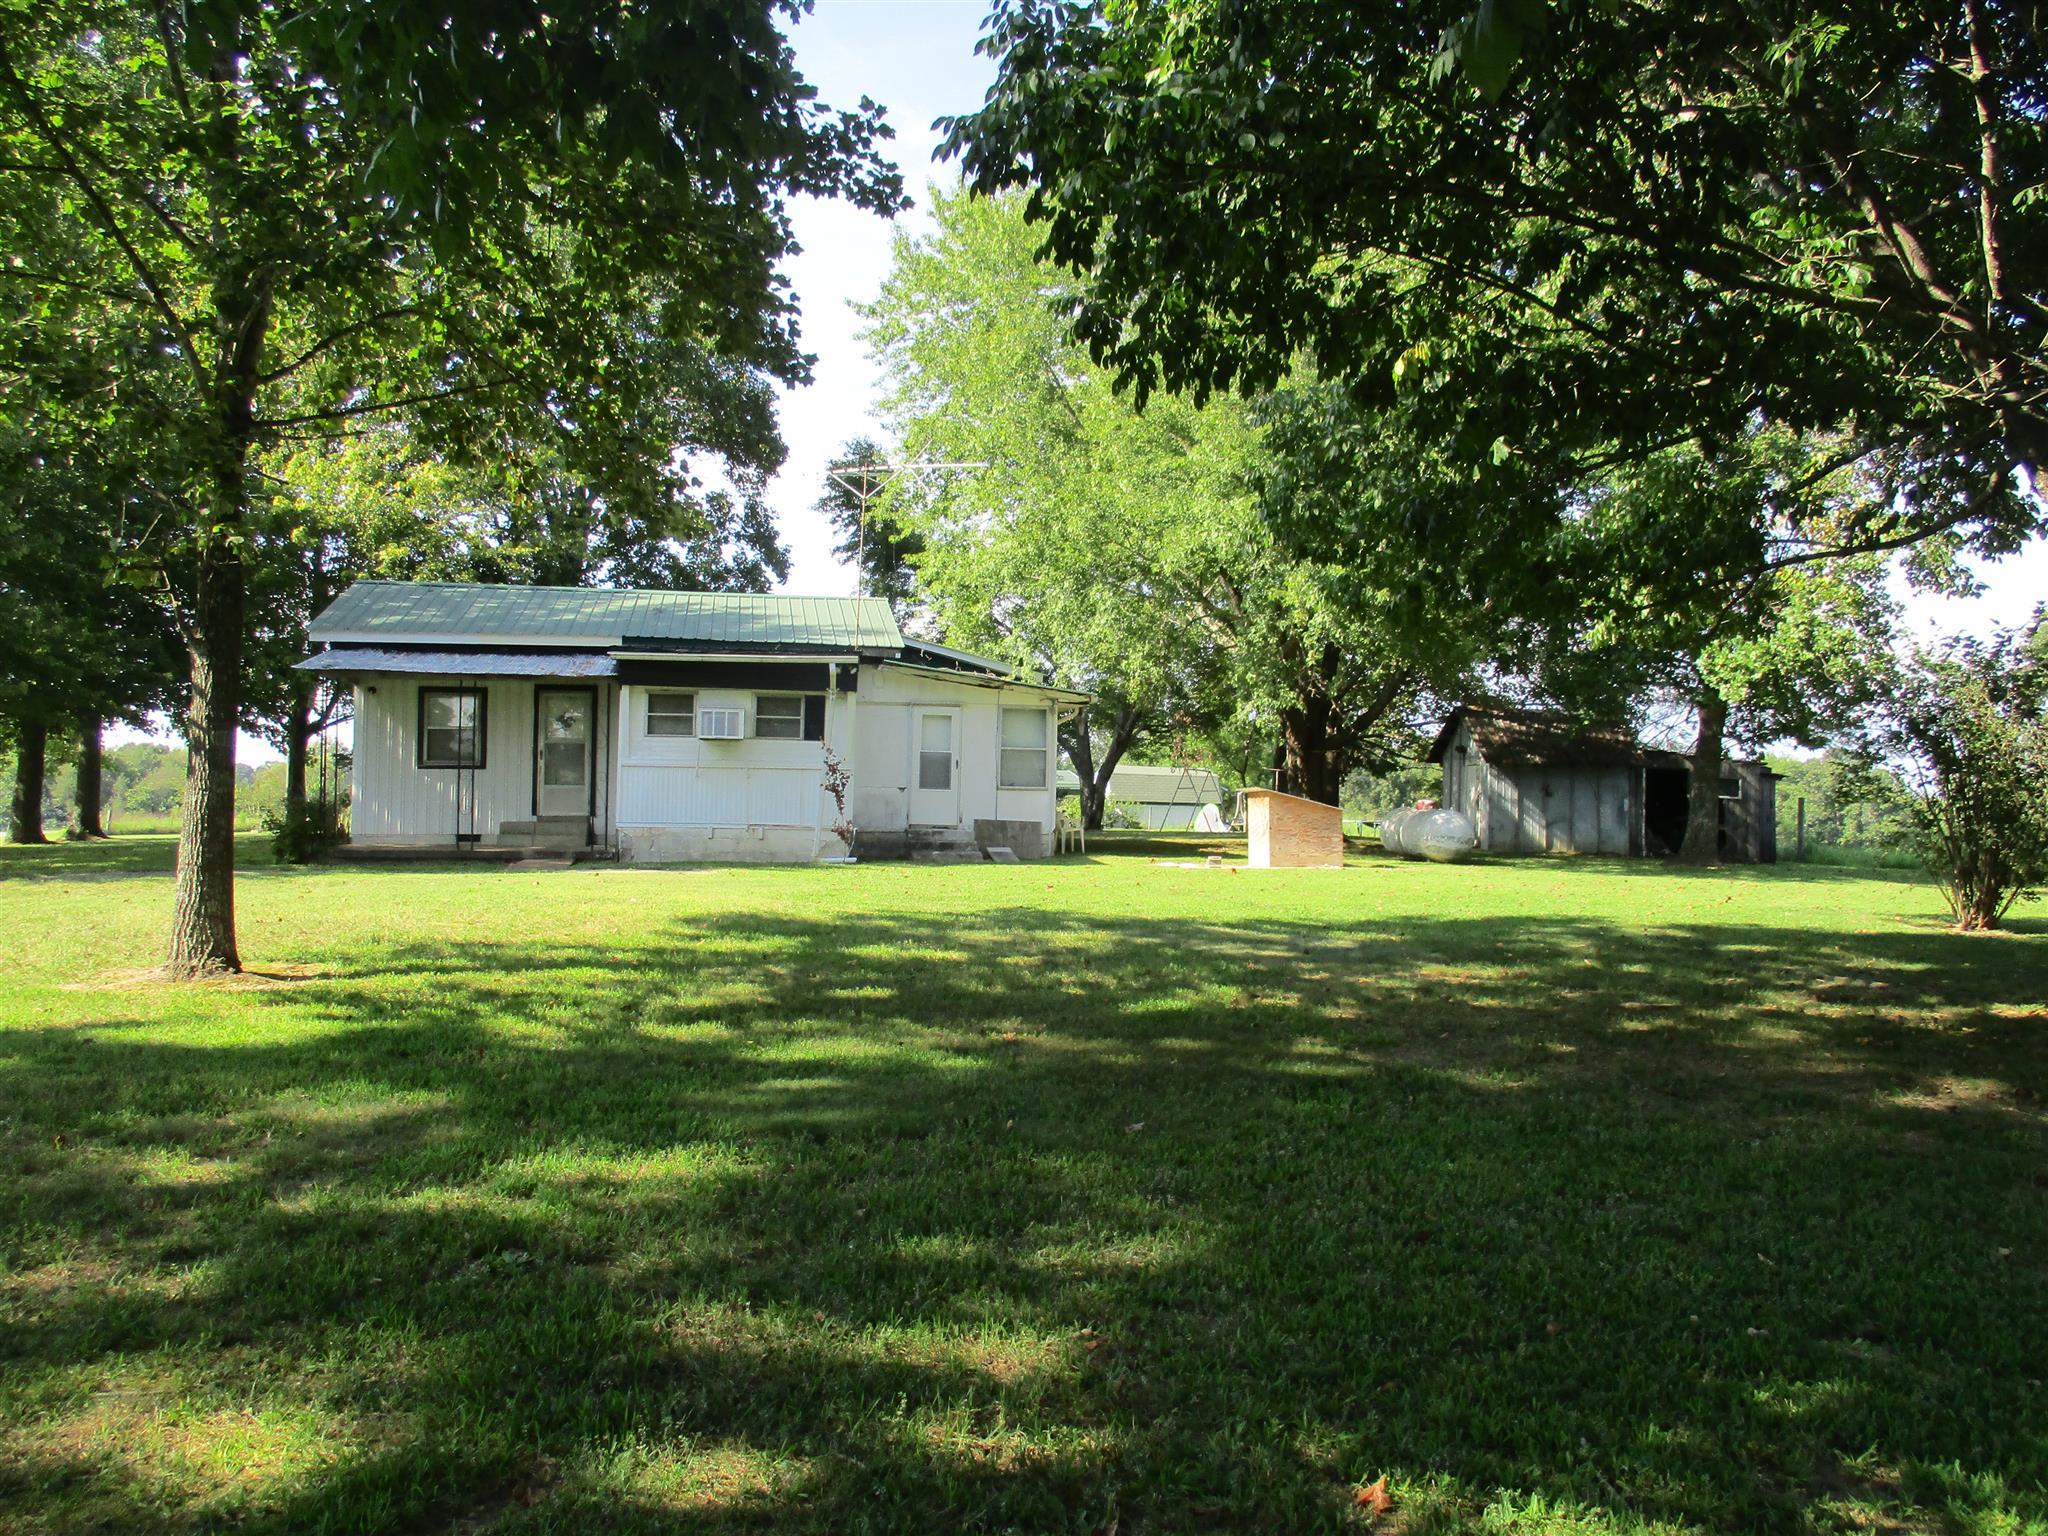 4413 Summertown Hwy, Summertown, TN 38483 - Summertown, TN real estate listing